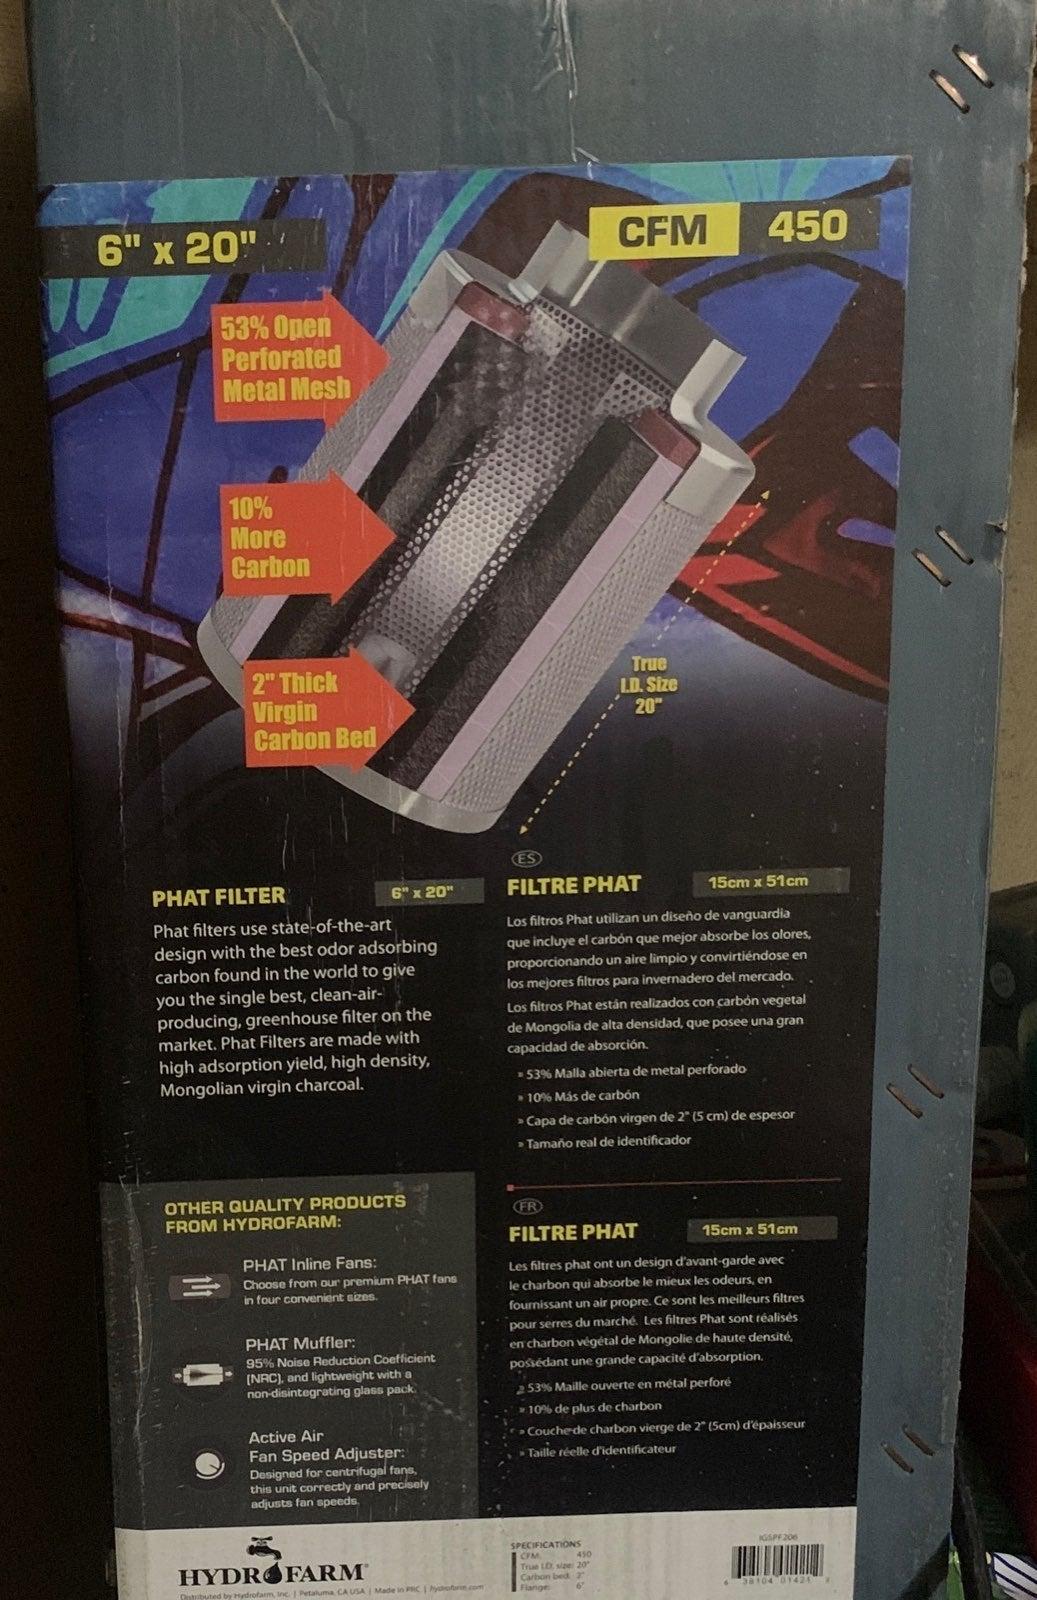 PHAT carbon filter 6-20 450 cfm